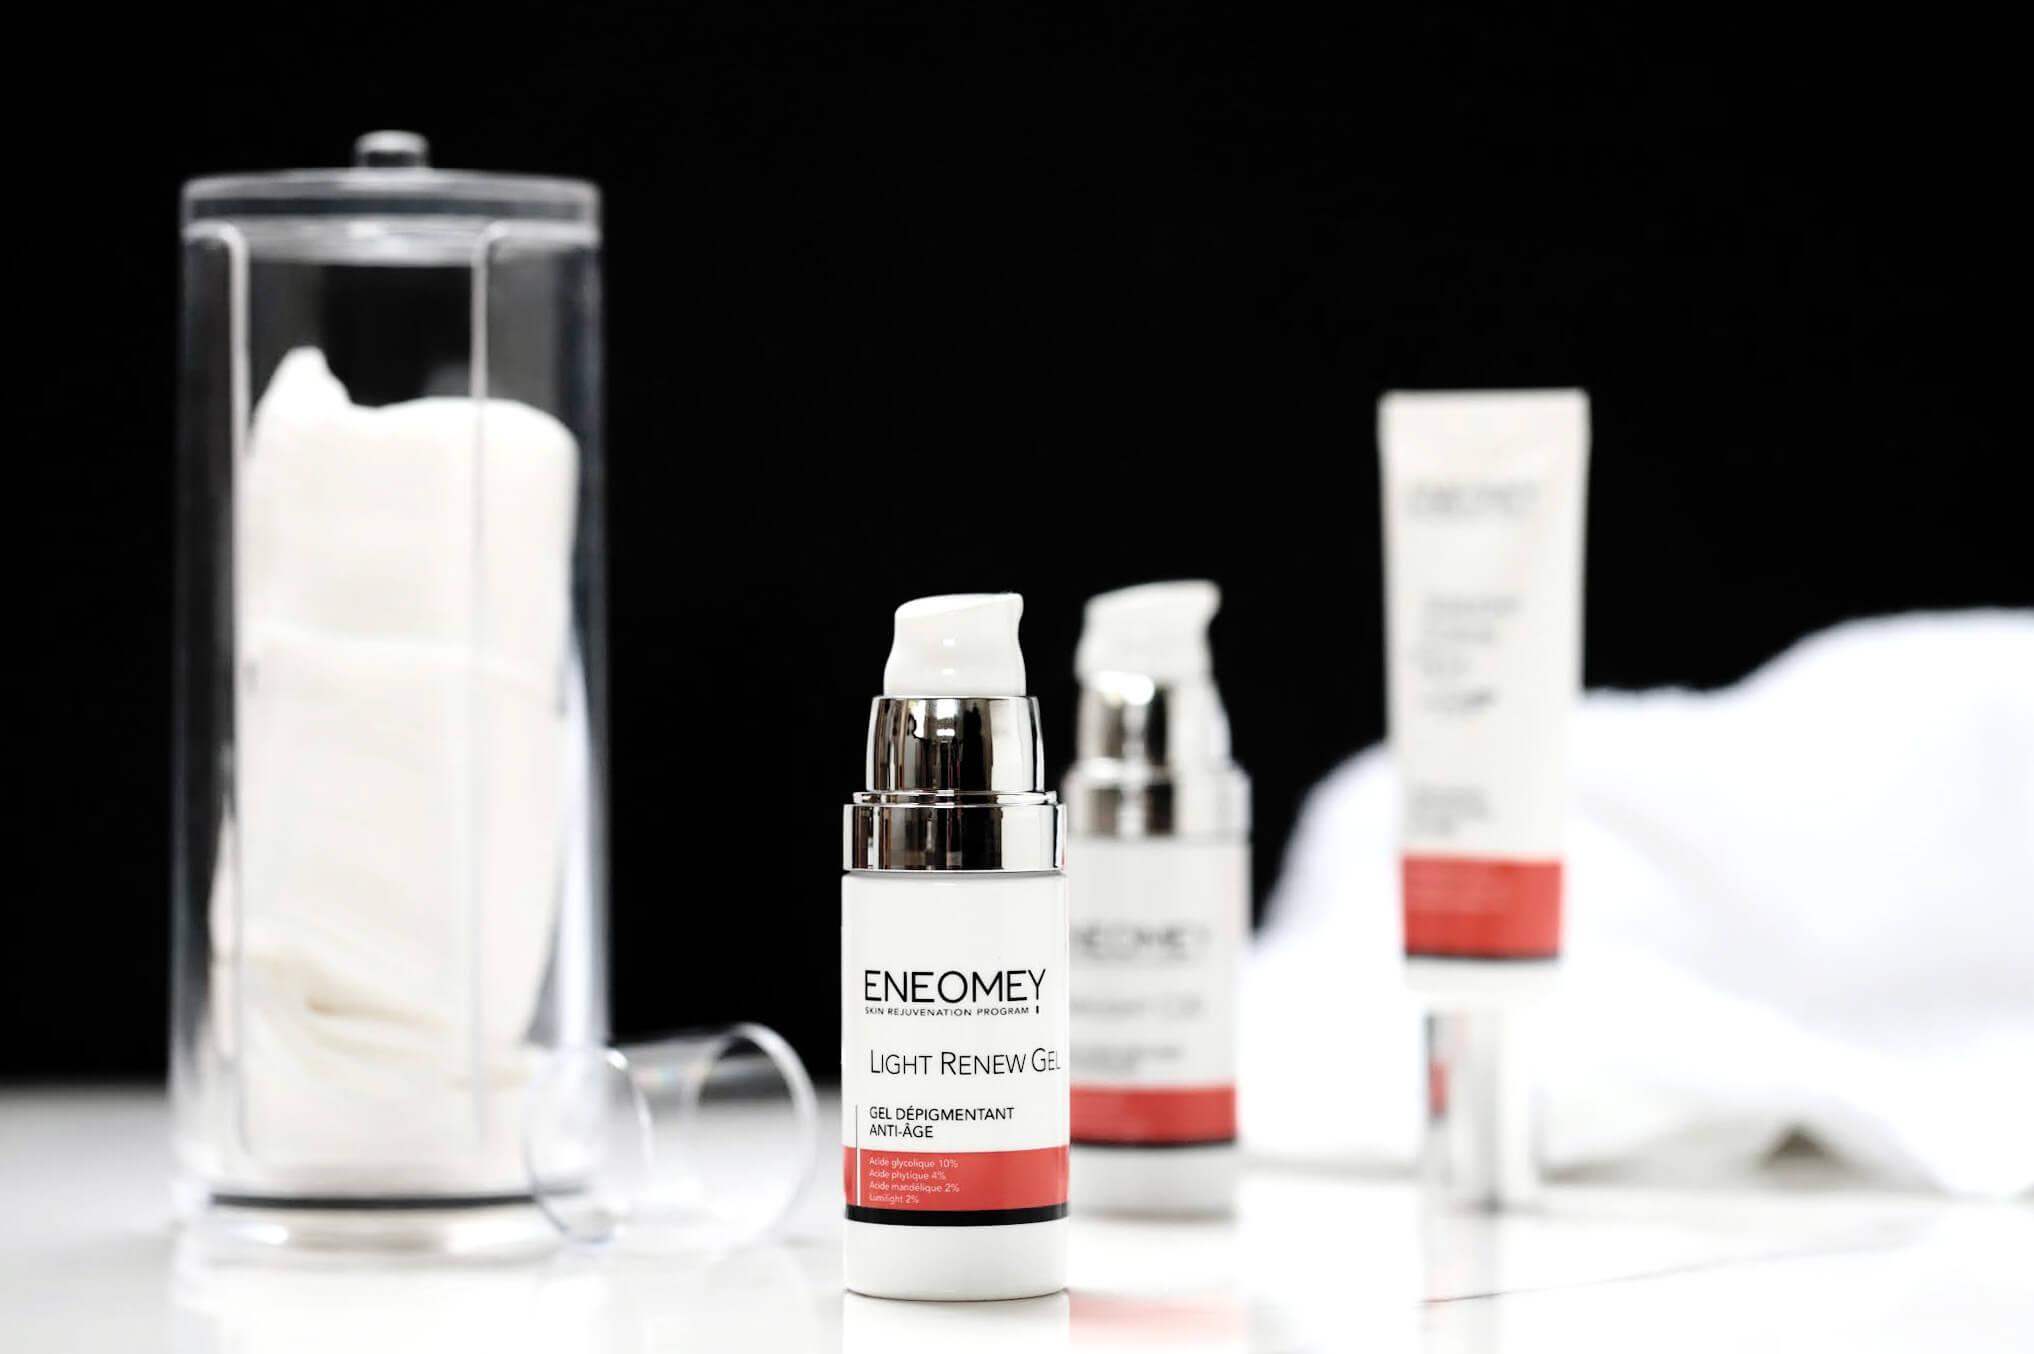 Eneomey light renew gel depigmentant anti age